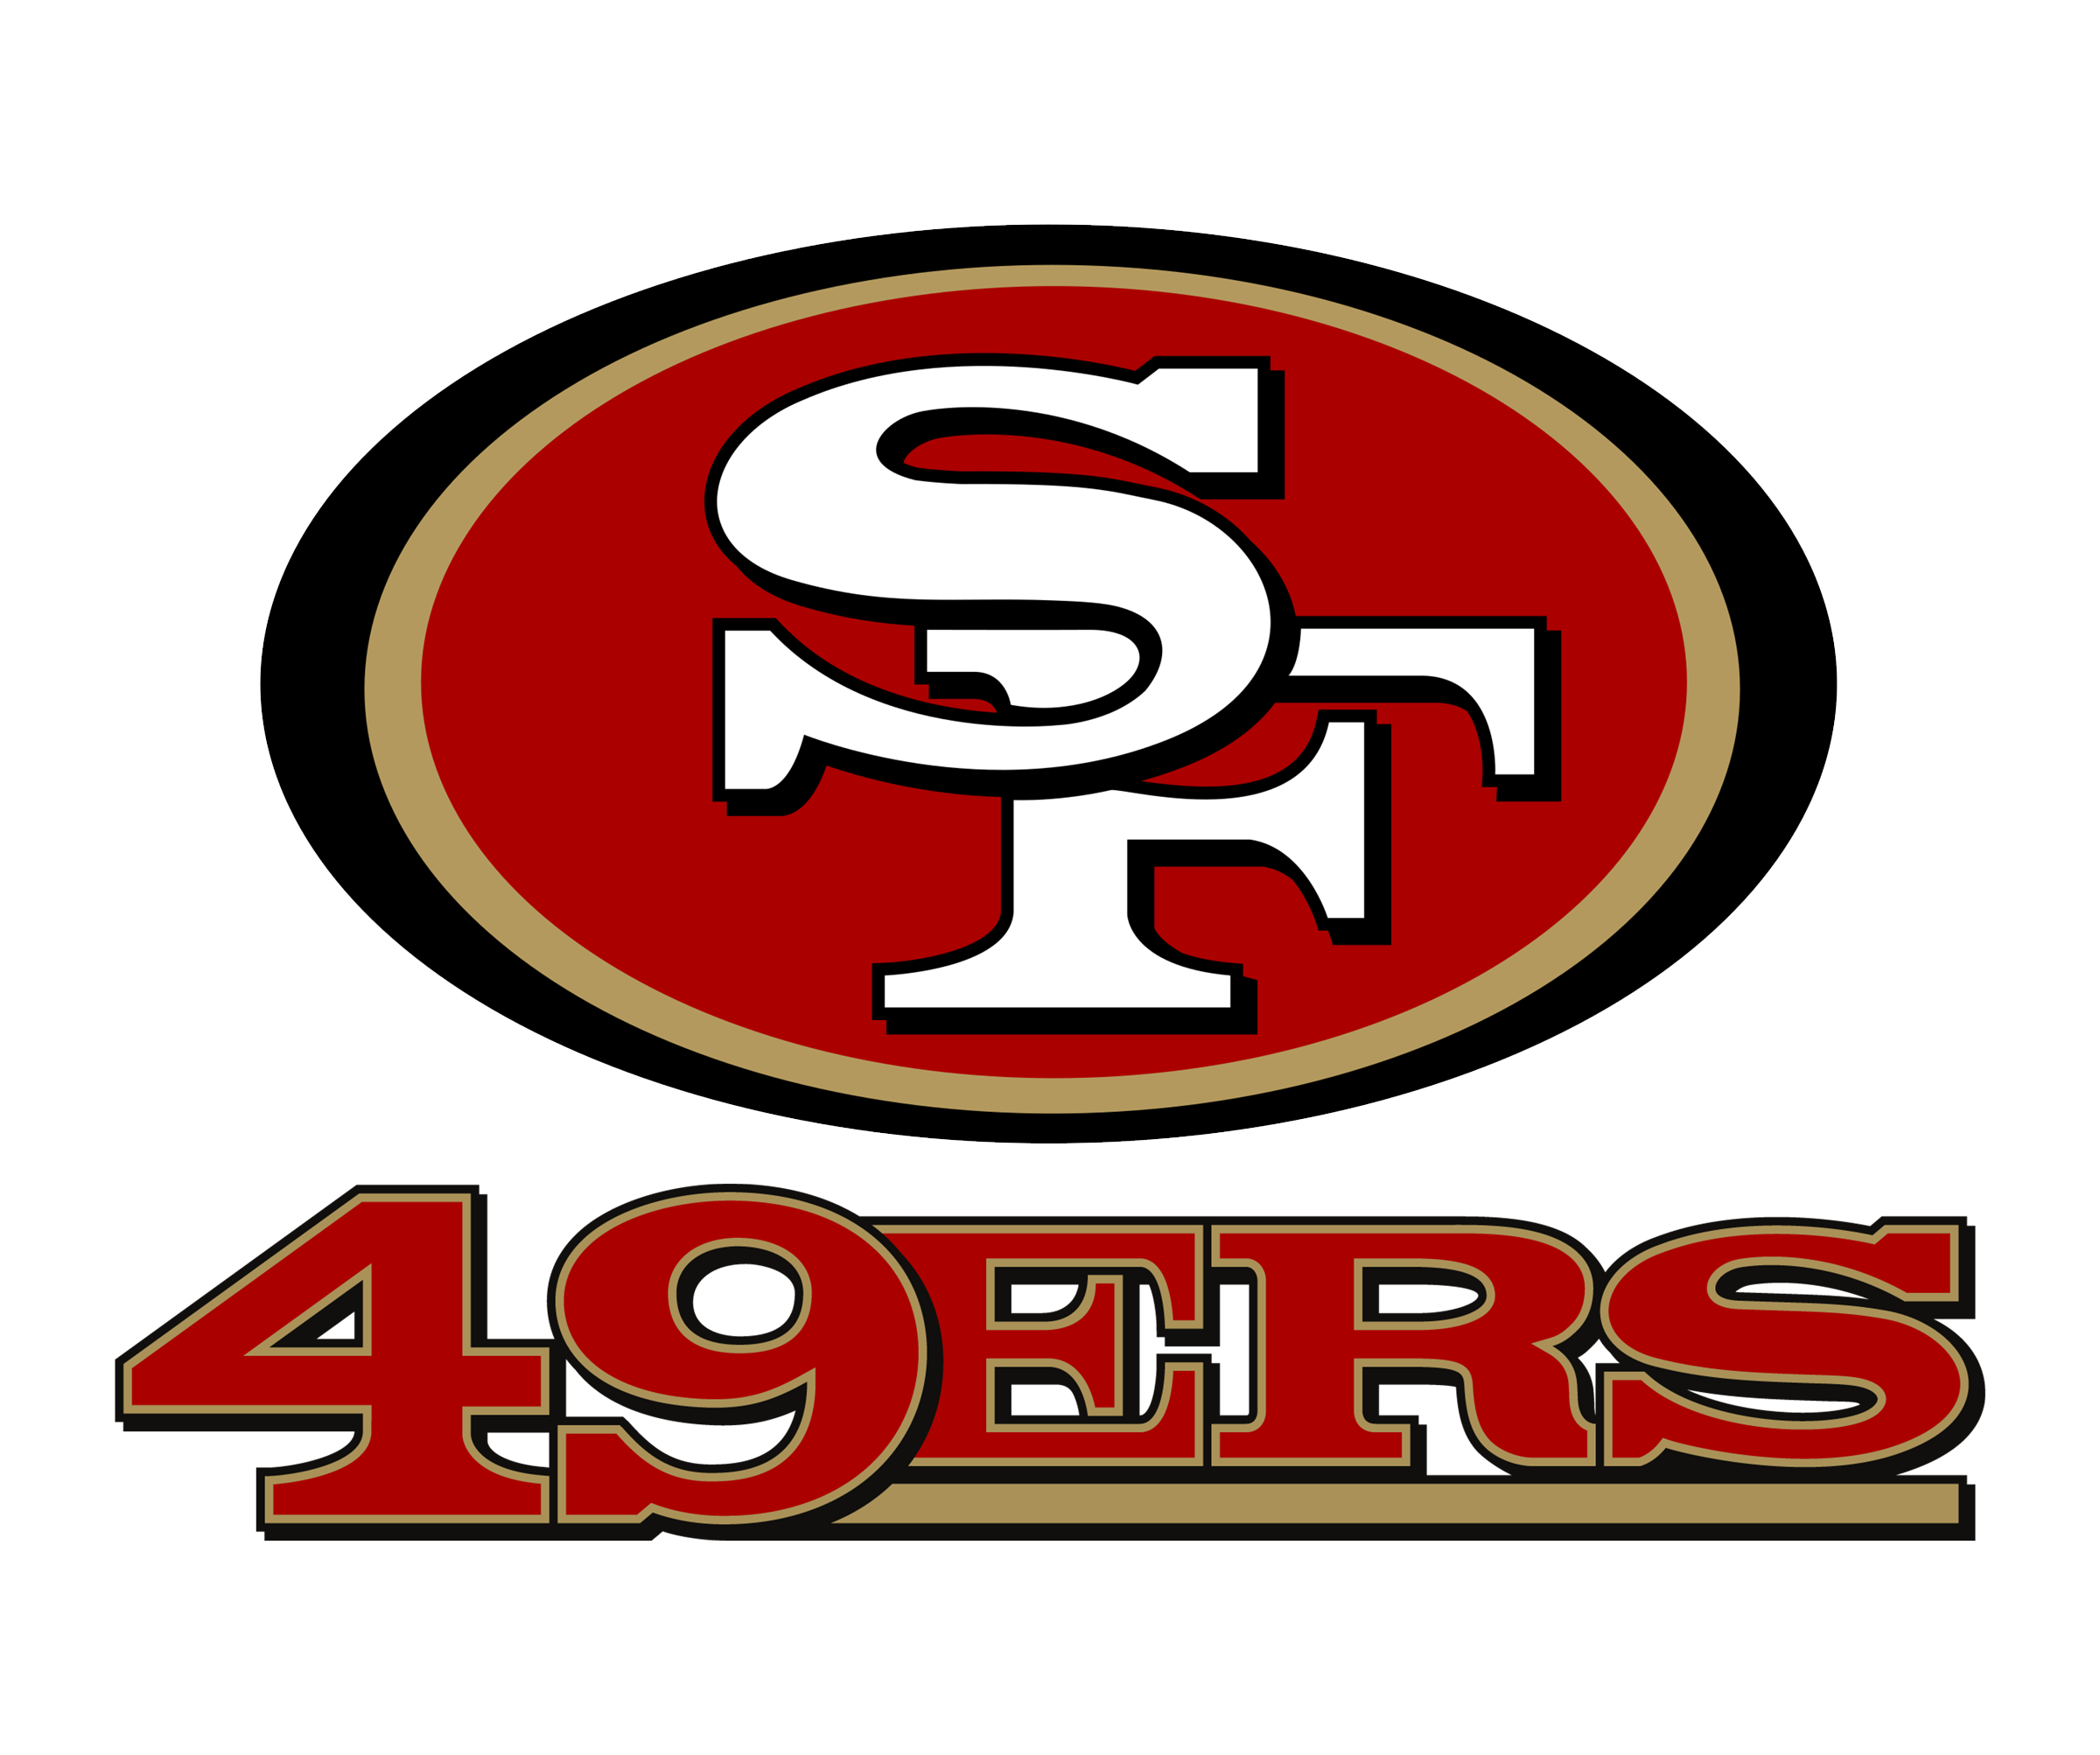 san francisco 49ers logo png transparent svg vector freebie supply rh freebiesupply com Dragon Logo Vector 49ers logo vector free